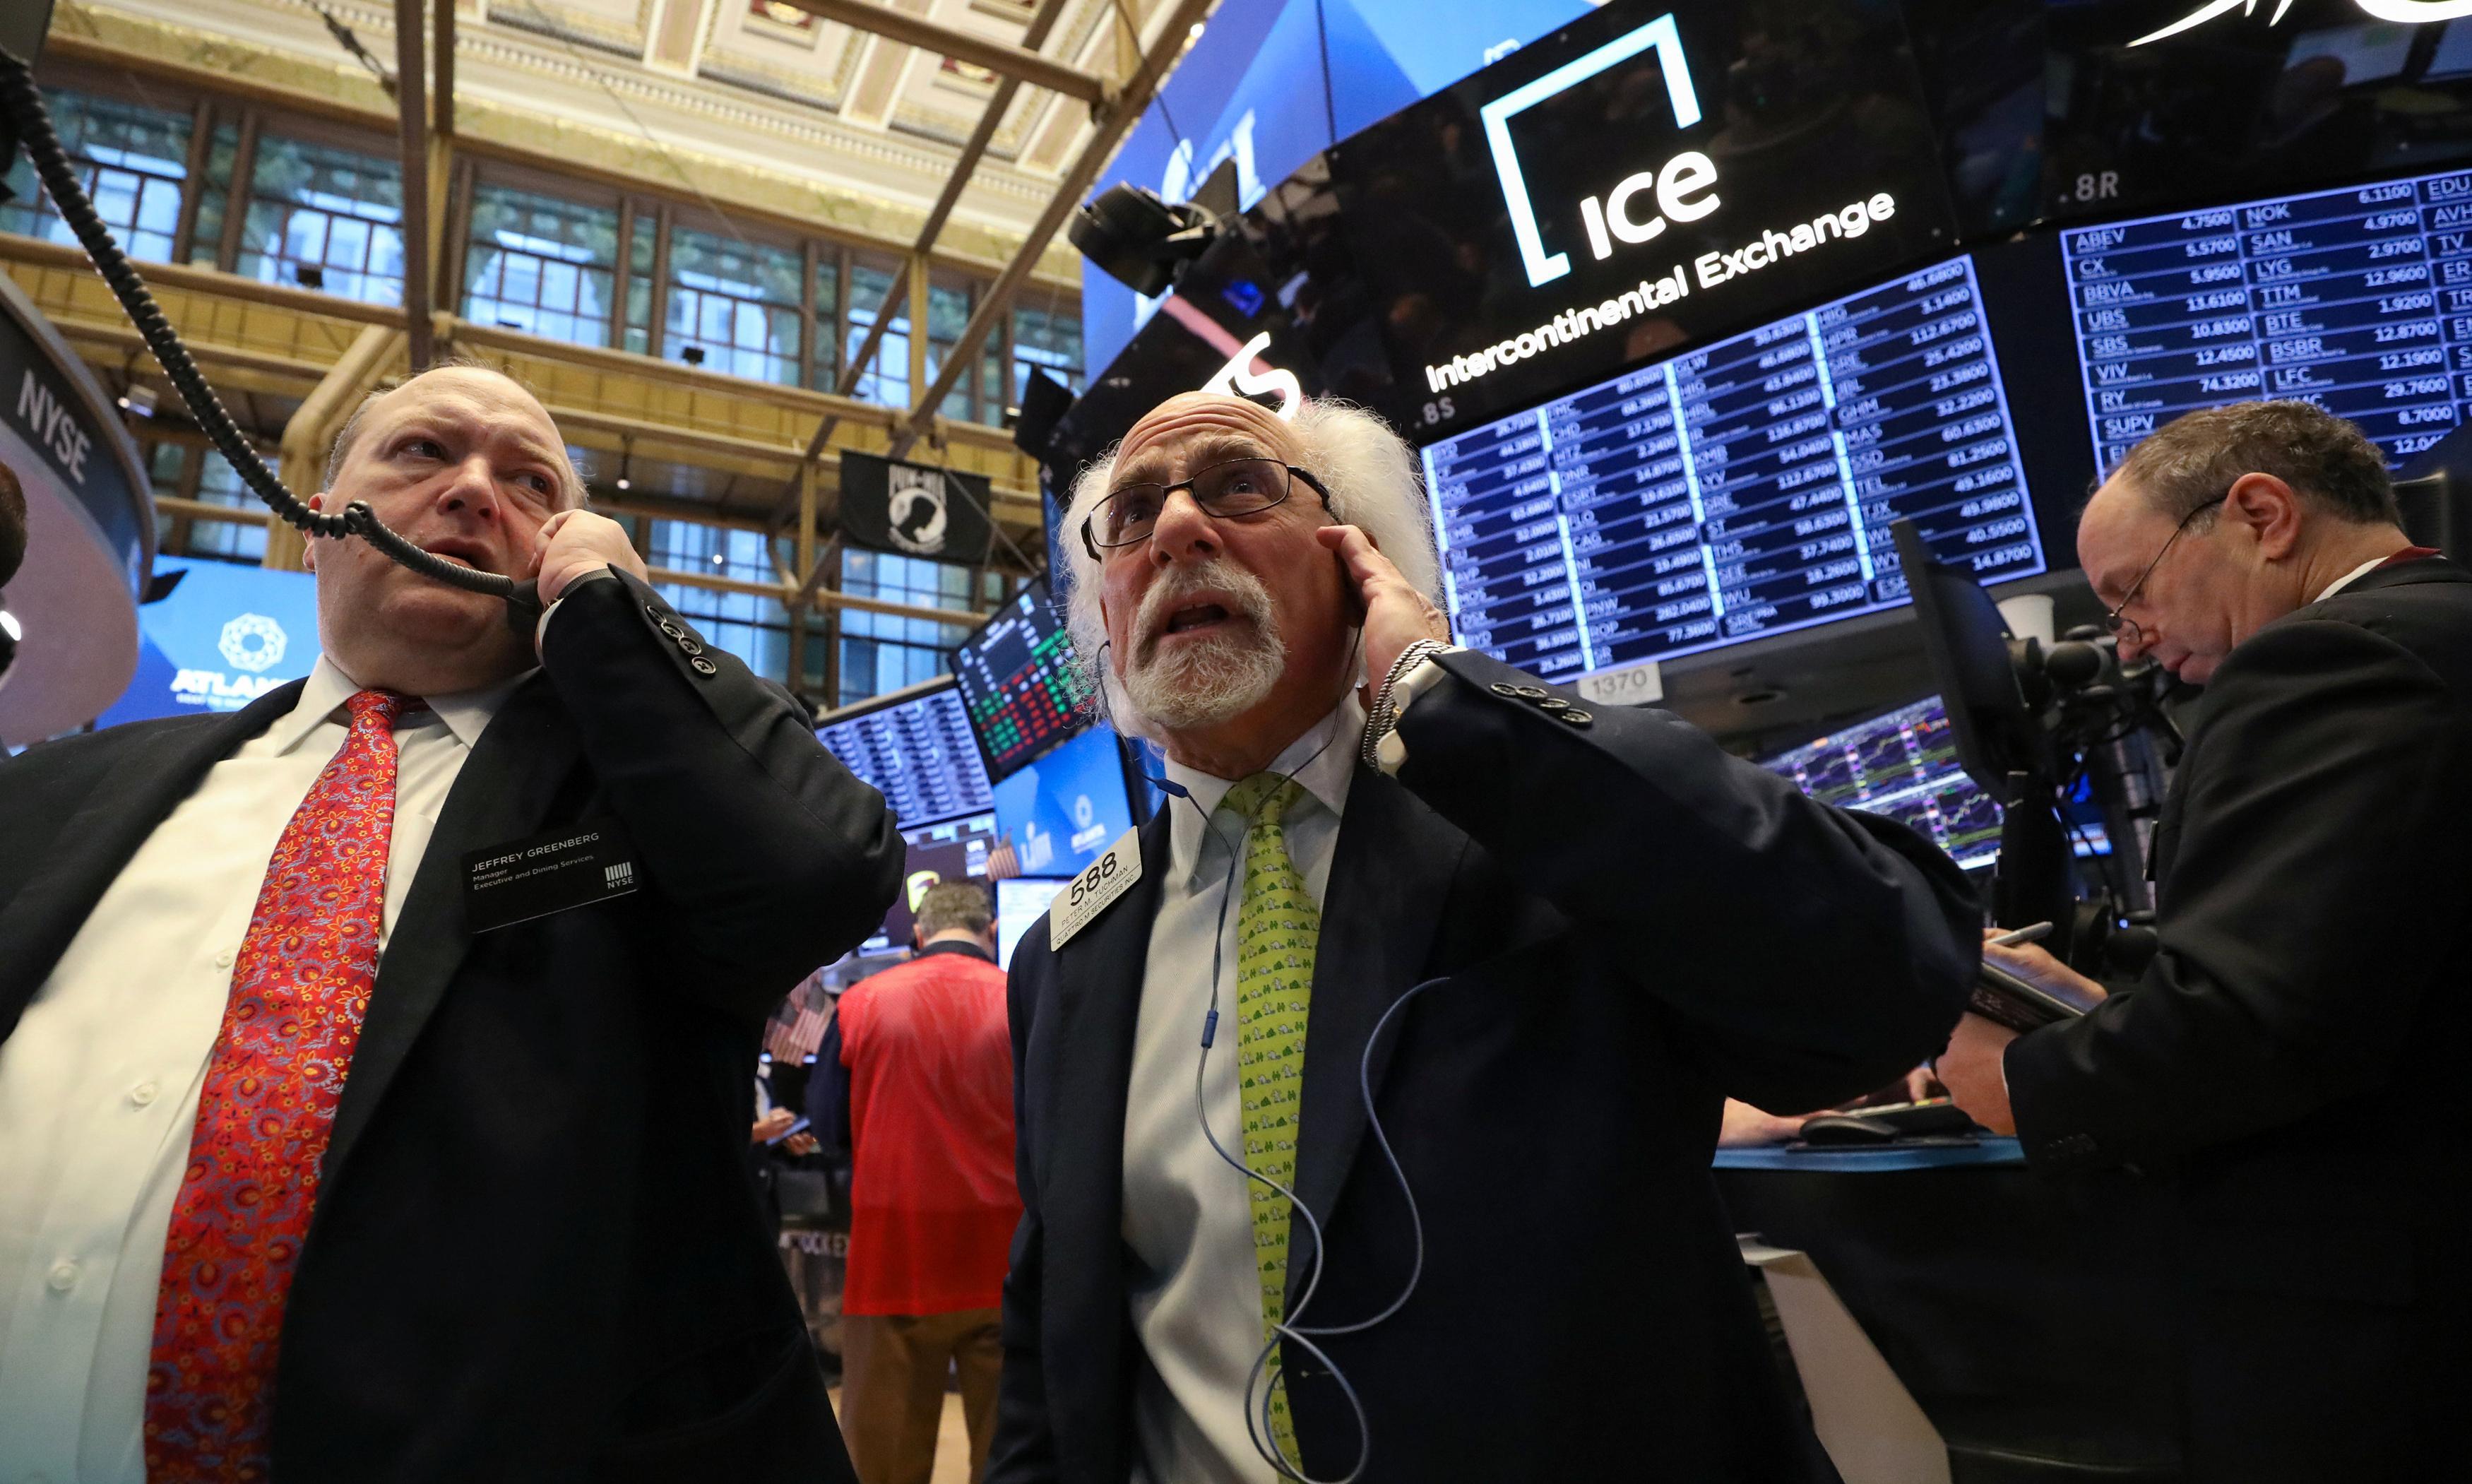 Stock markets slip amid signs global economy is weakening